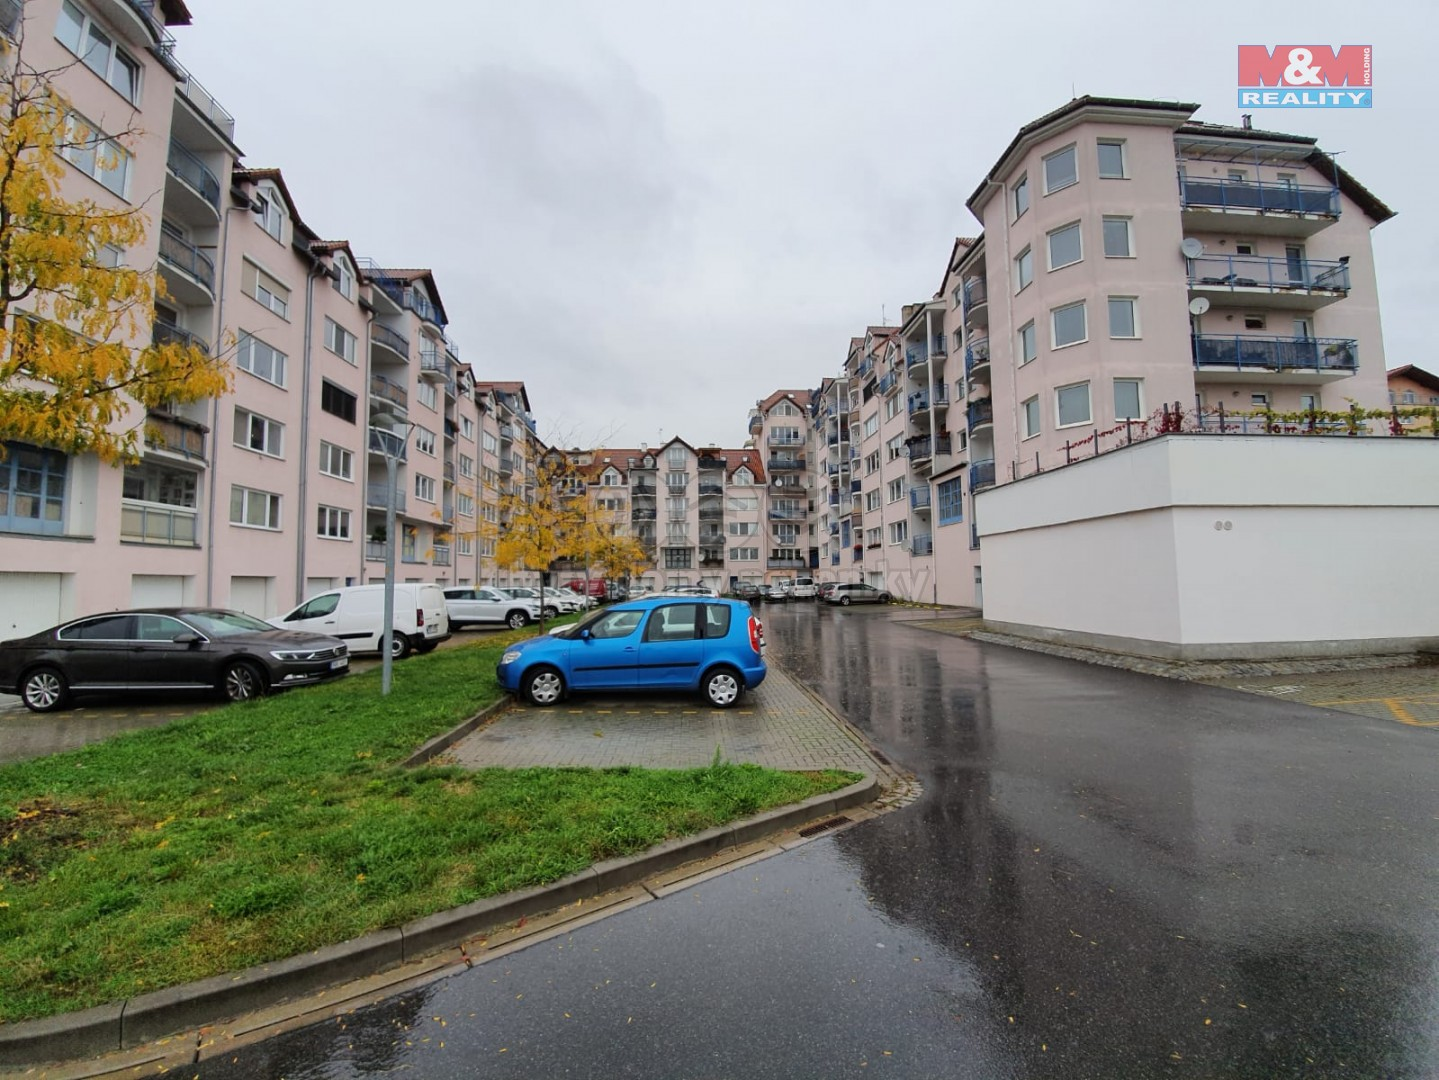 Pronájem bytu 2+1, 68 m², Olomouc, ul. Rooseveltova